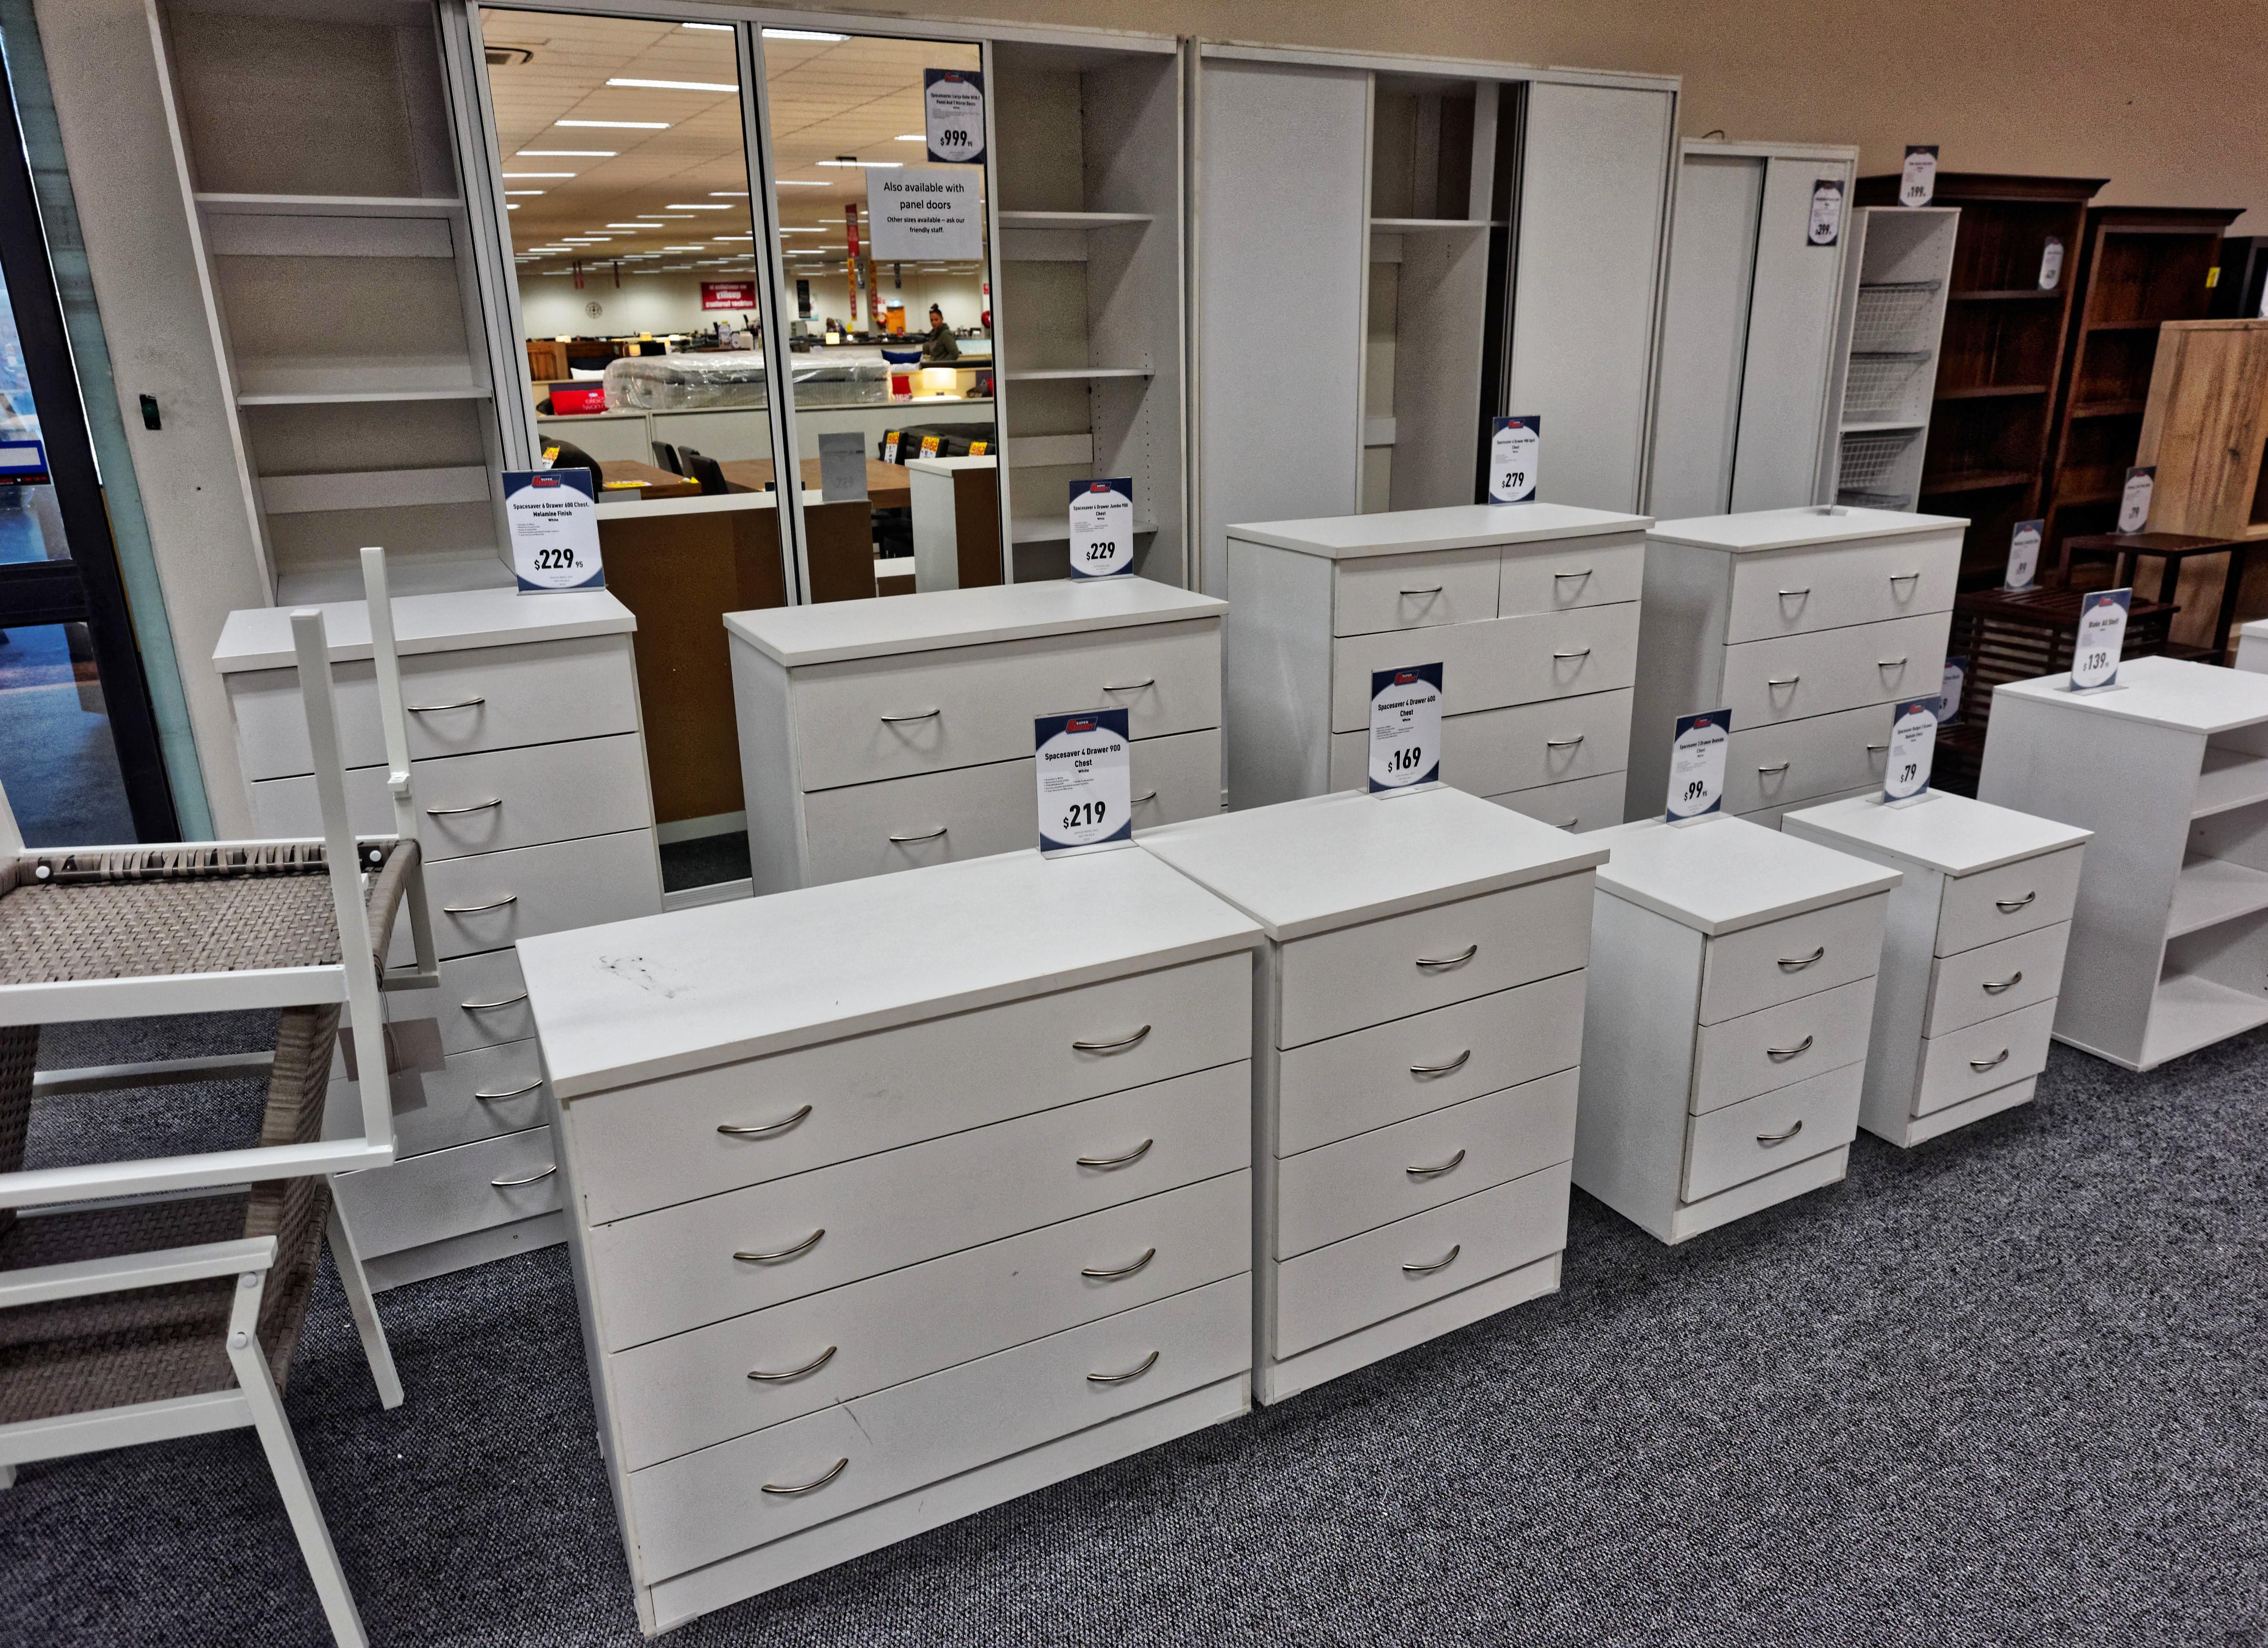 Furniture-1.jpeg